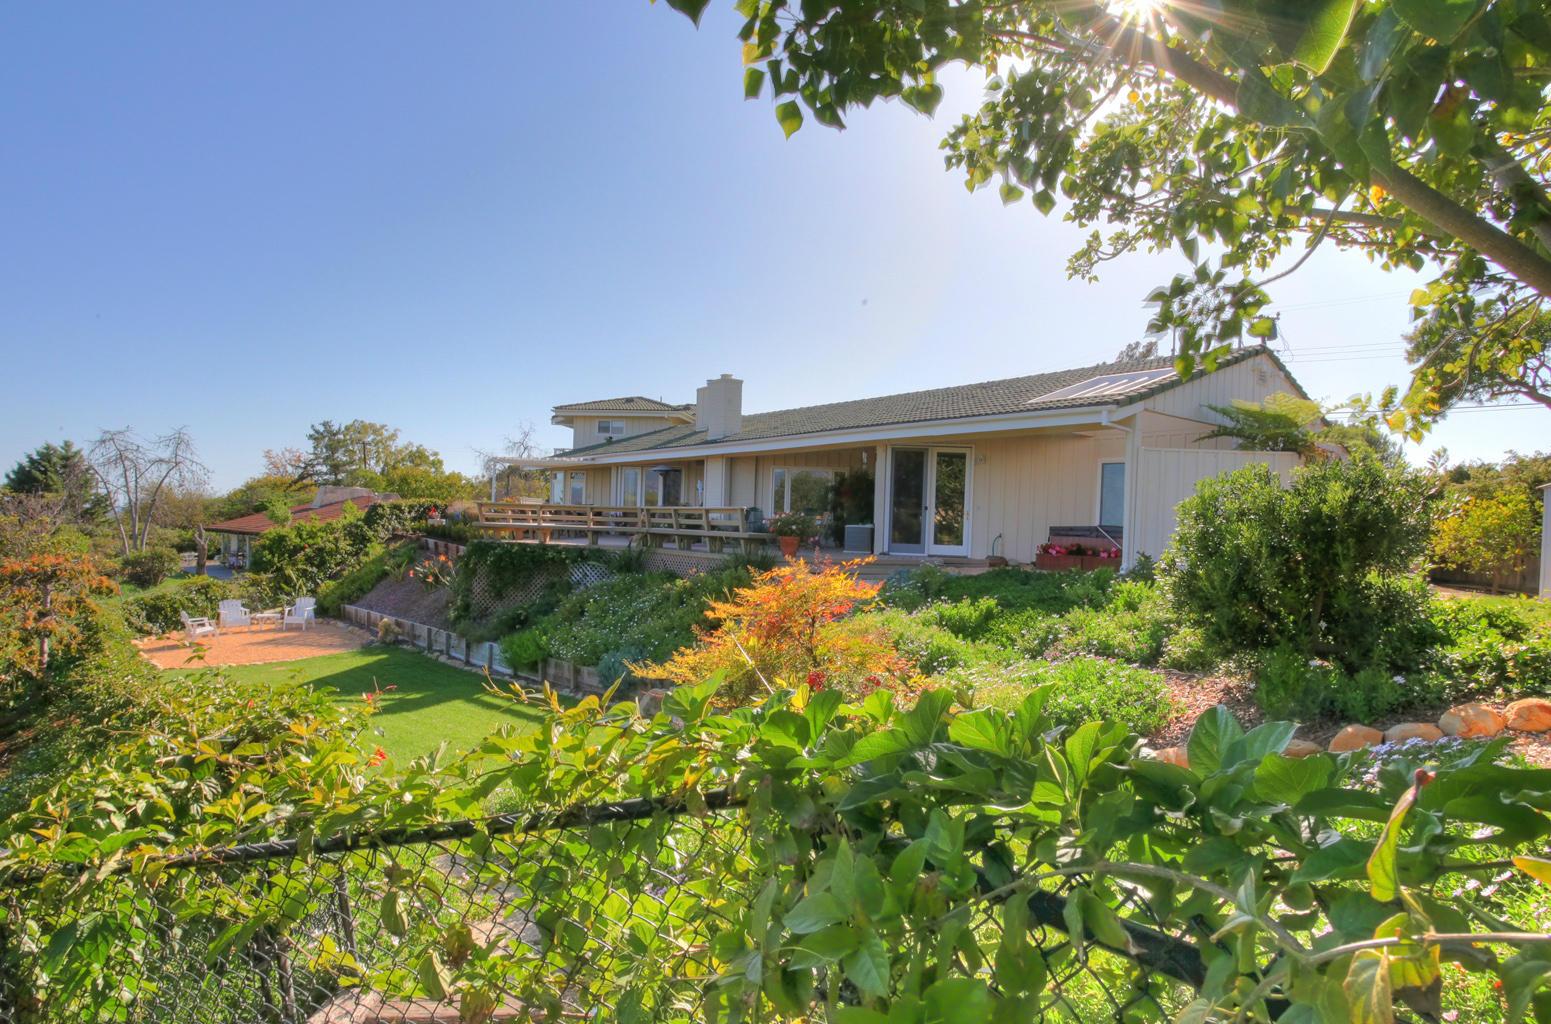 Property photo for 1312 Camino Manadero Santa Barbara, California 93111 - 14-1284